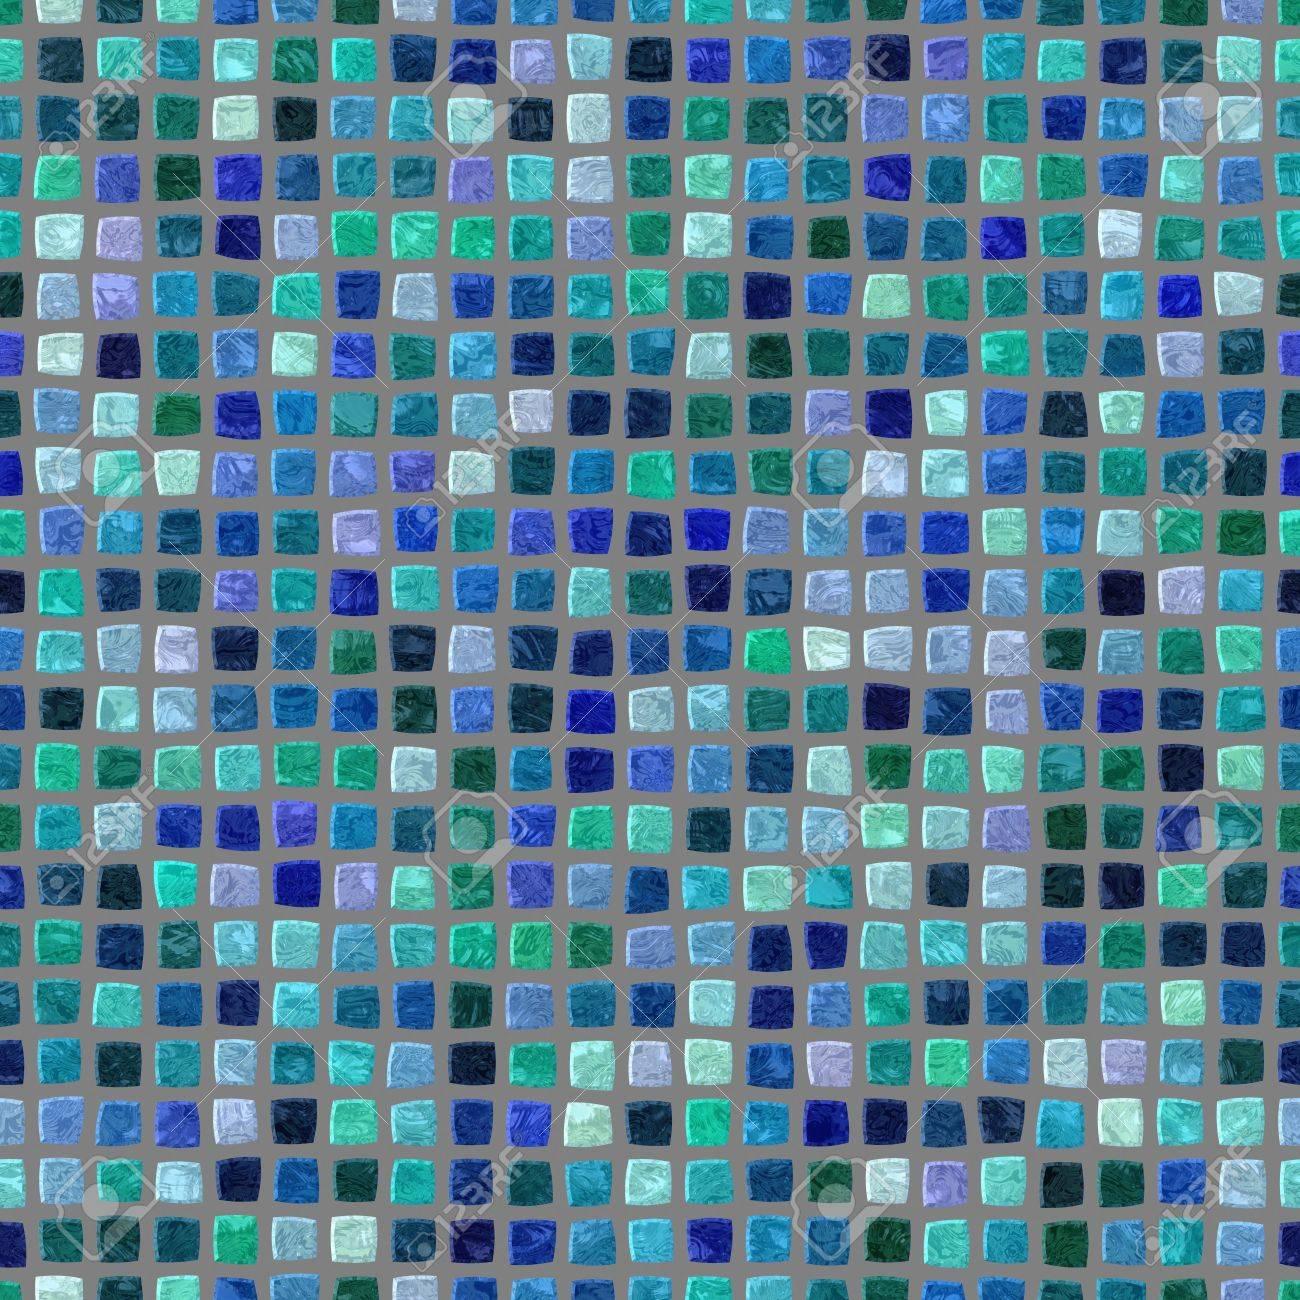 Fliesen Mosaik Turkis Mosaikfliesen Glas Knopf Braun Turkis Mix